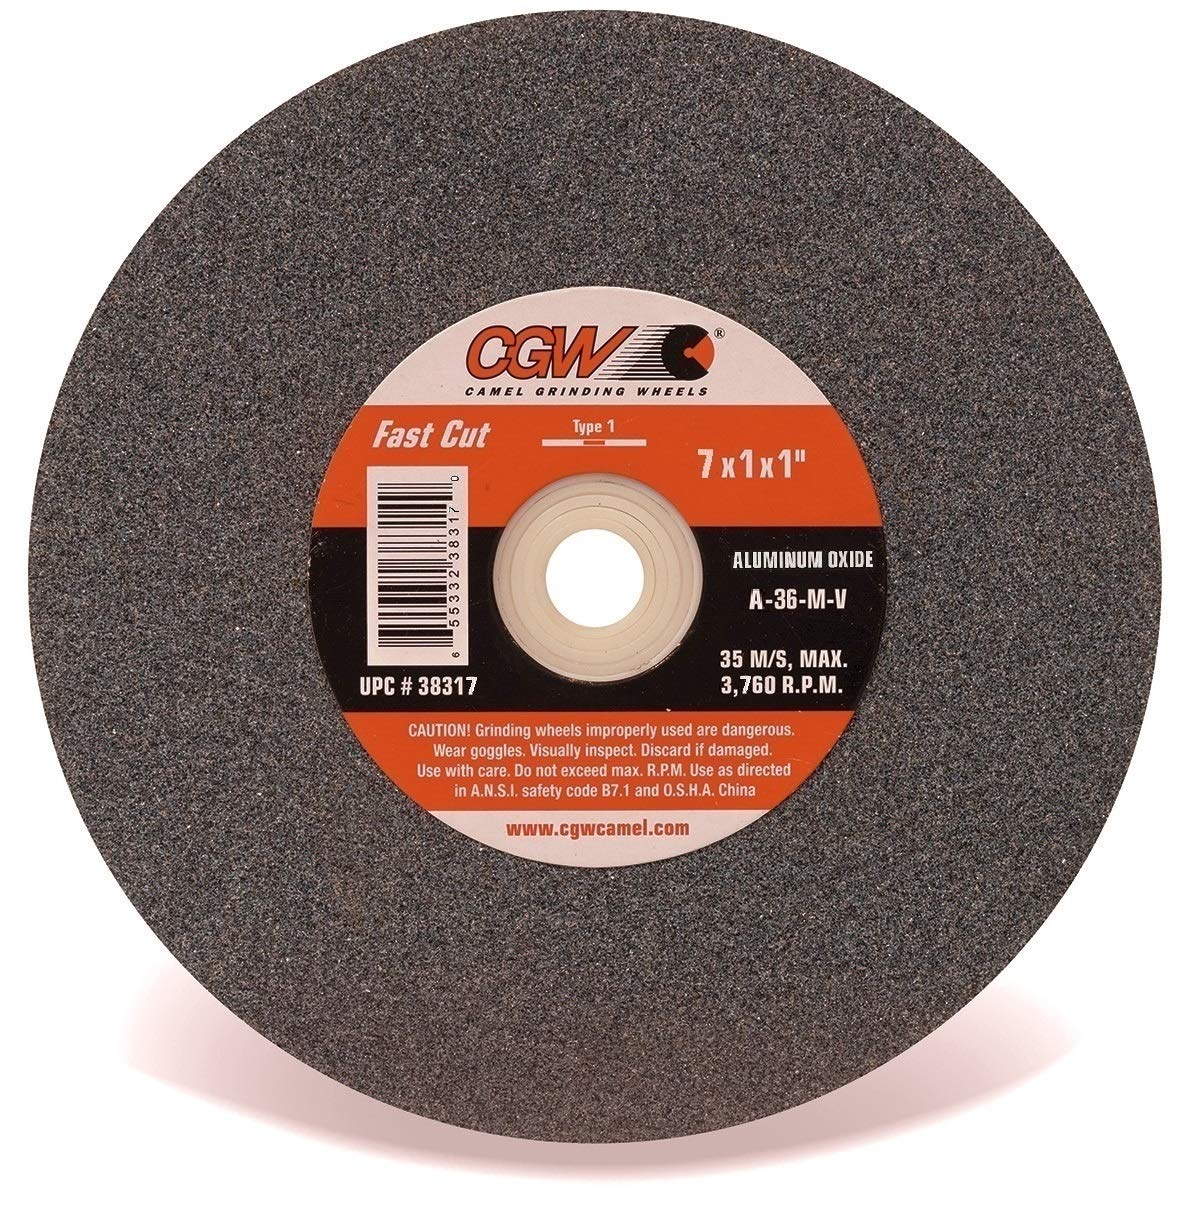 Aluminum Oxide Bench /& Pedestal Fast Cut Grinding Wheel Grit-36 3760 R.P.M. CGW One 7 x 7 X 1 Type-1